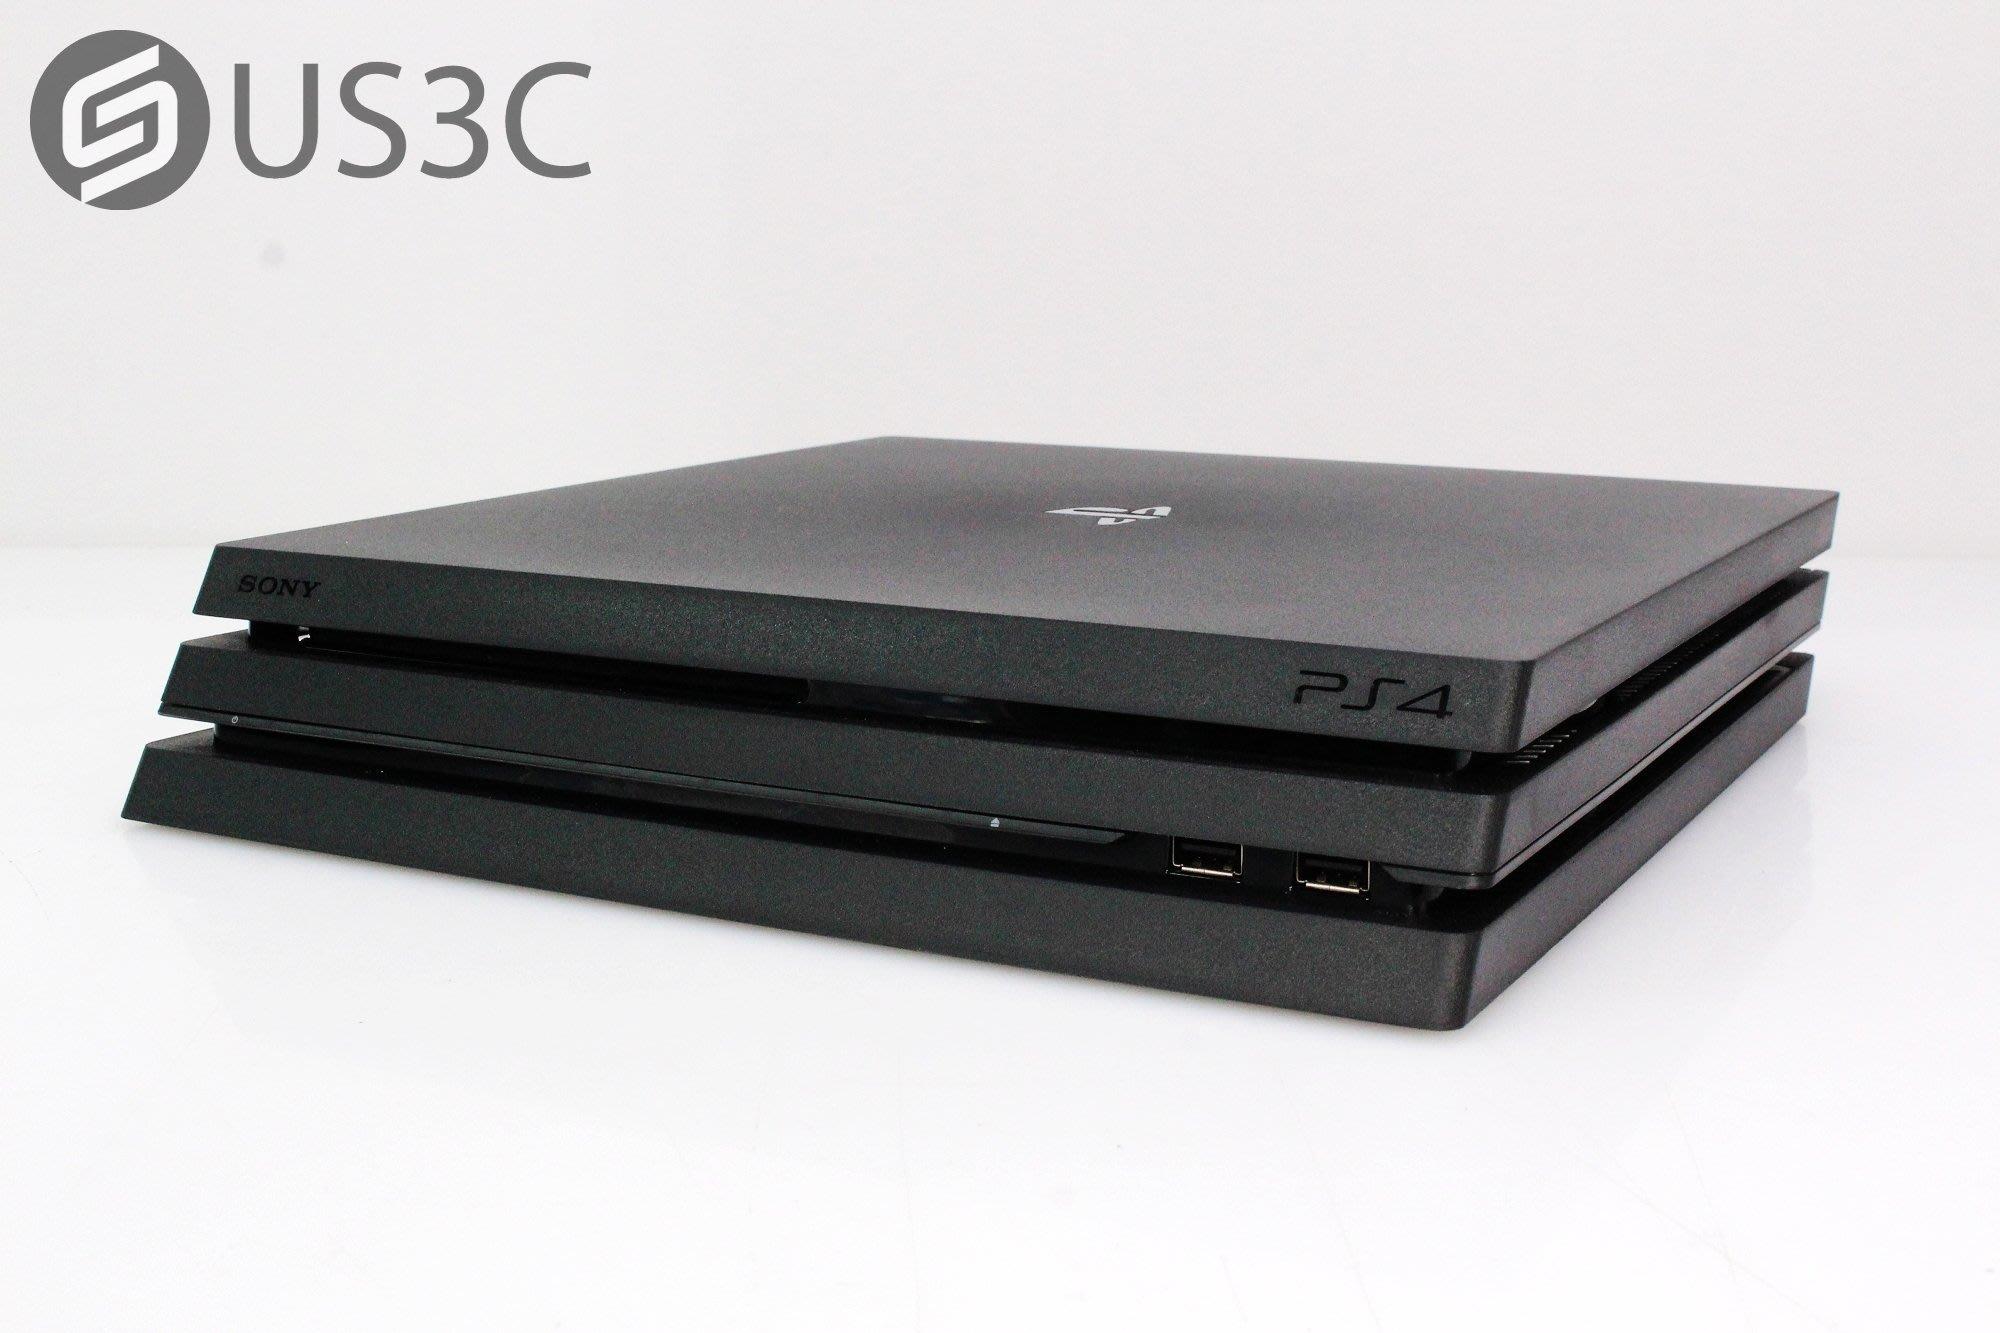 【US3C-小南門店】公司貨 索尼 Sony PS4 Pro CUH-7218B/7218型 極致黑 1TB 4K HDR 電玩主機 二手主機